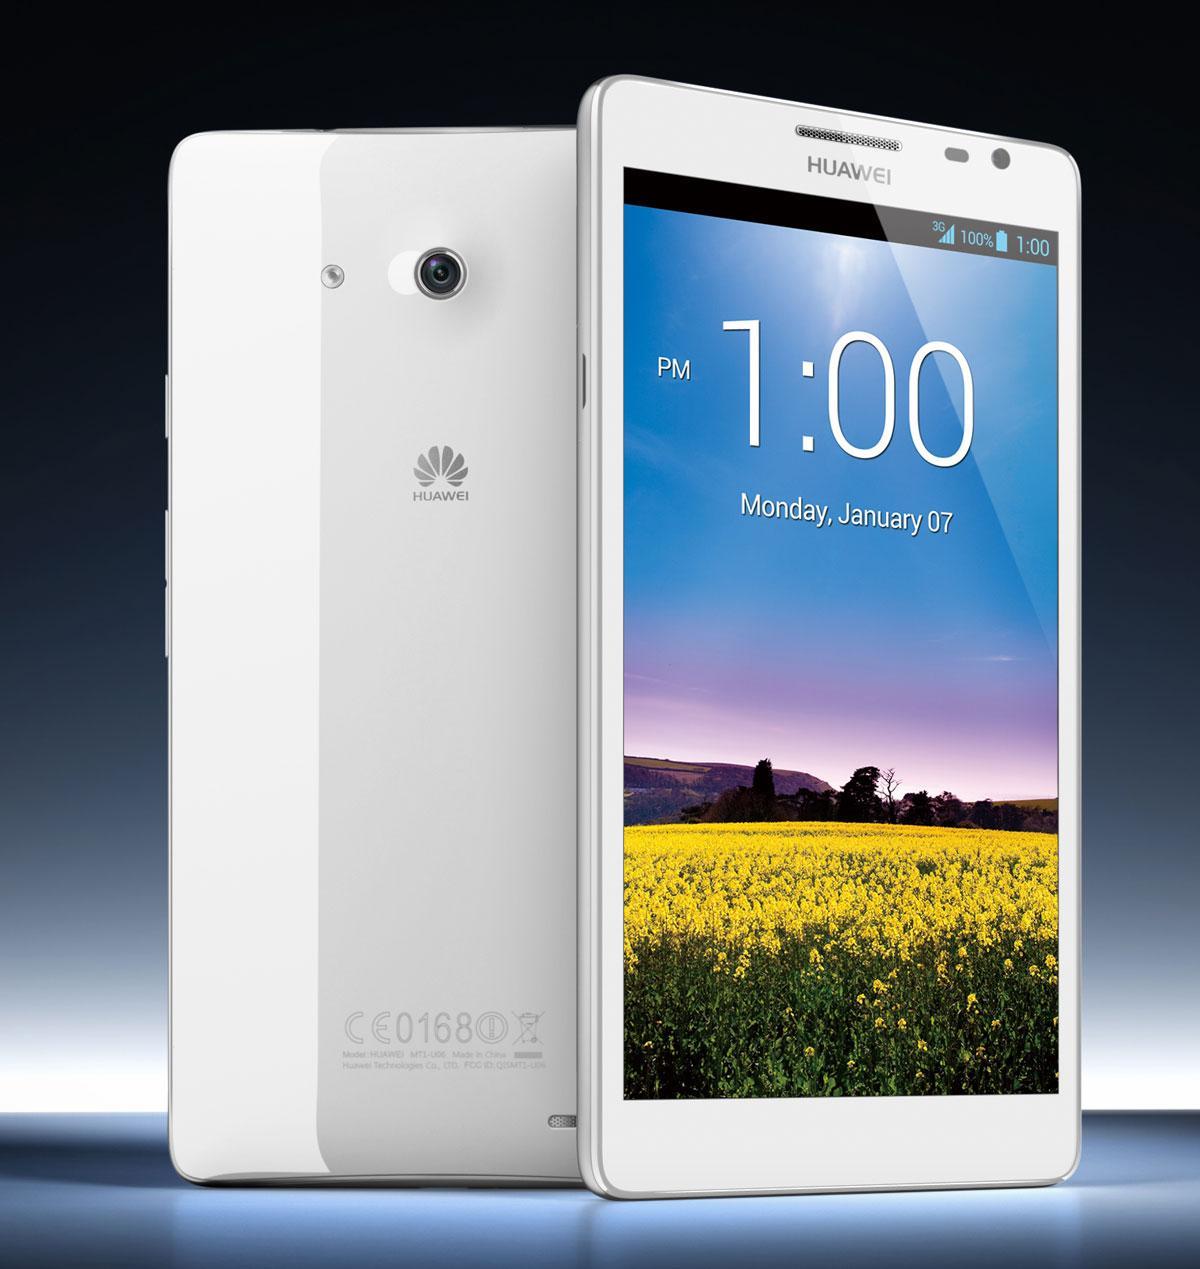 Huawei Ascend Mate en color blanco